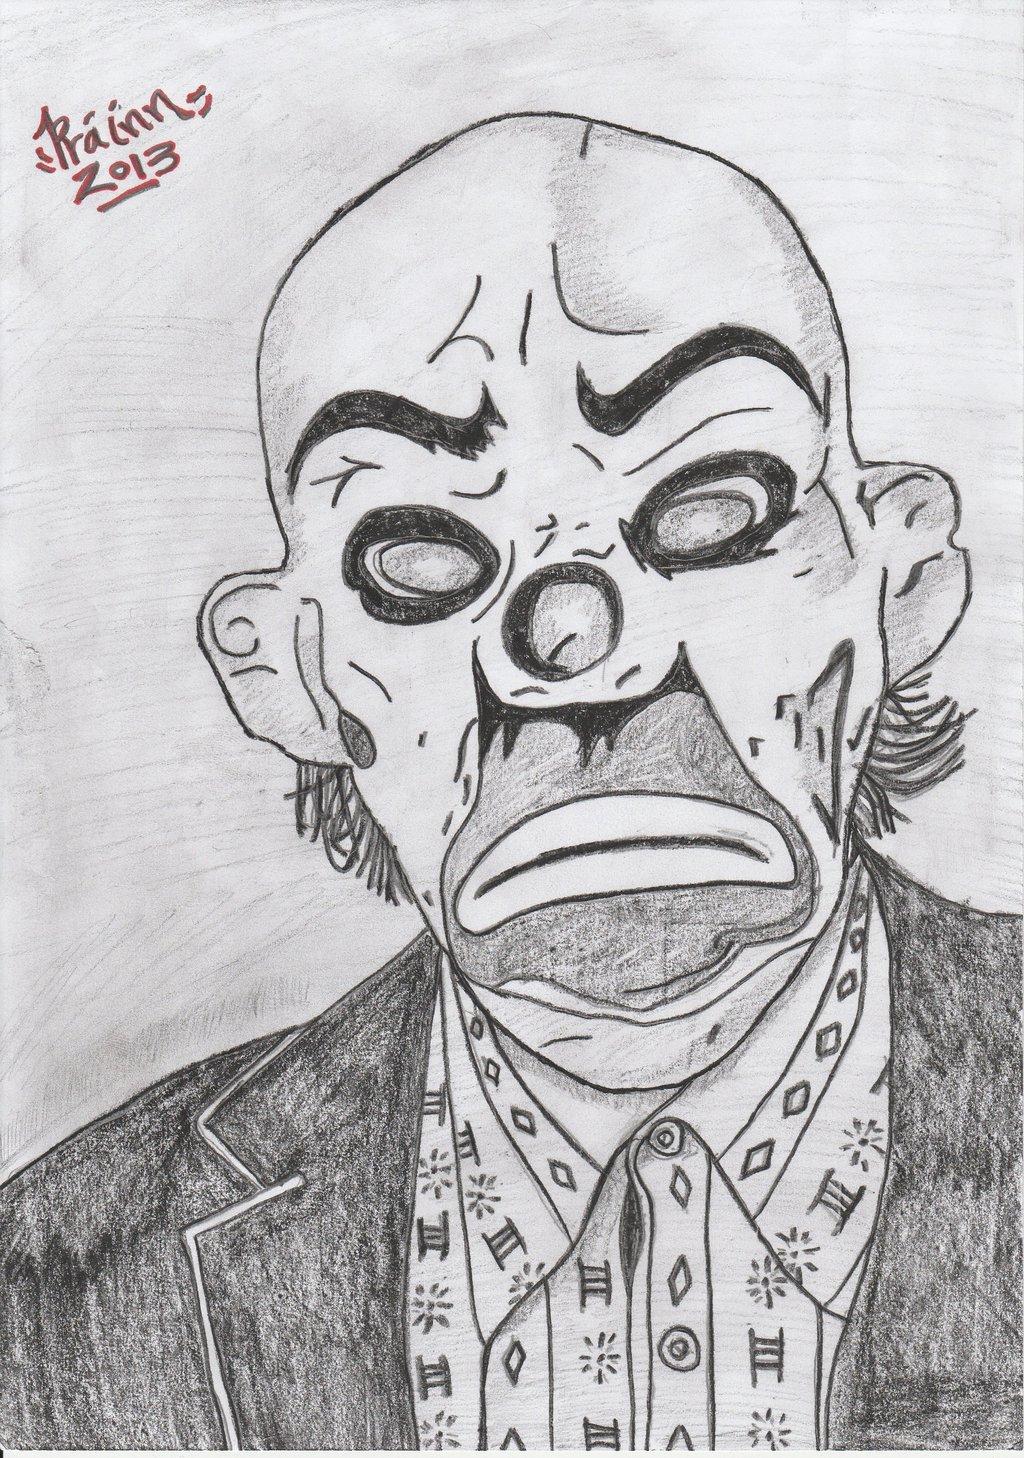 Drawn masks robber Of Mask) Batman MadMan Robber